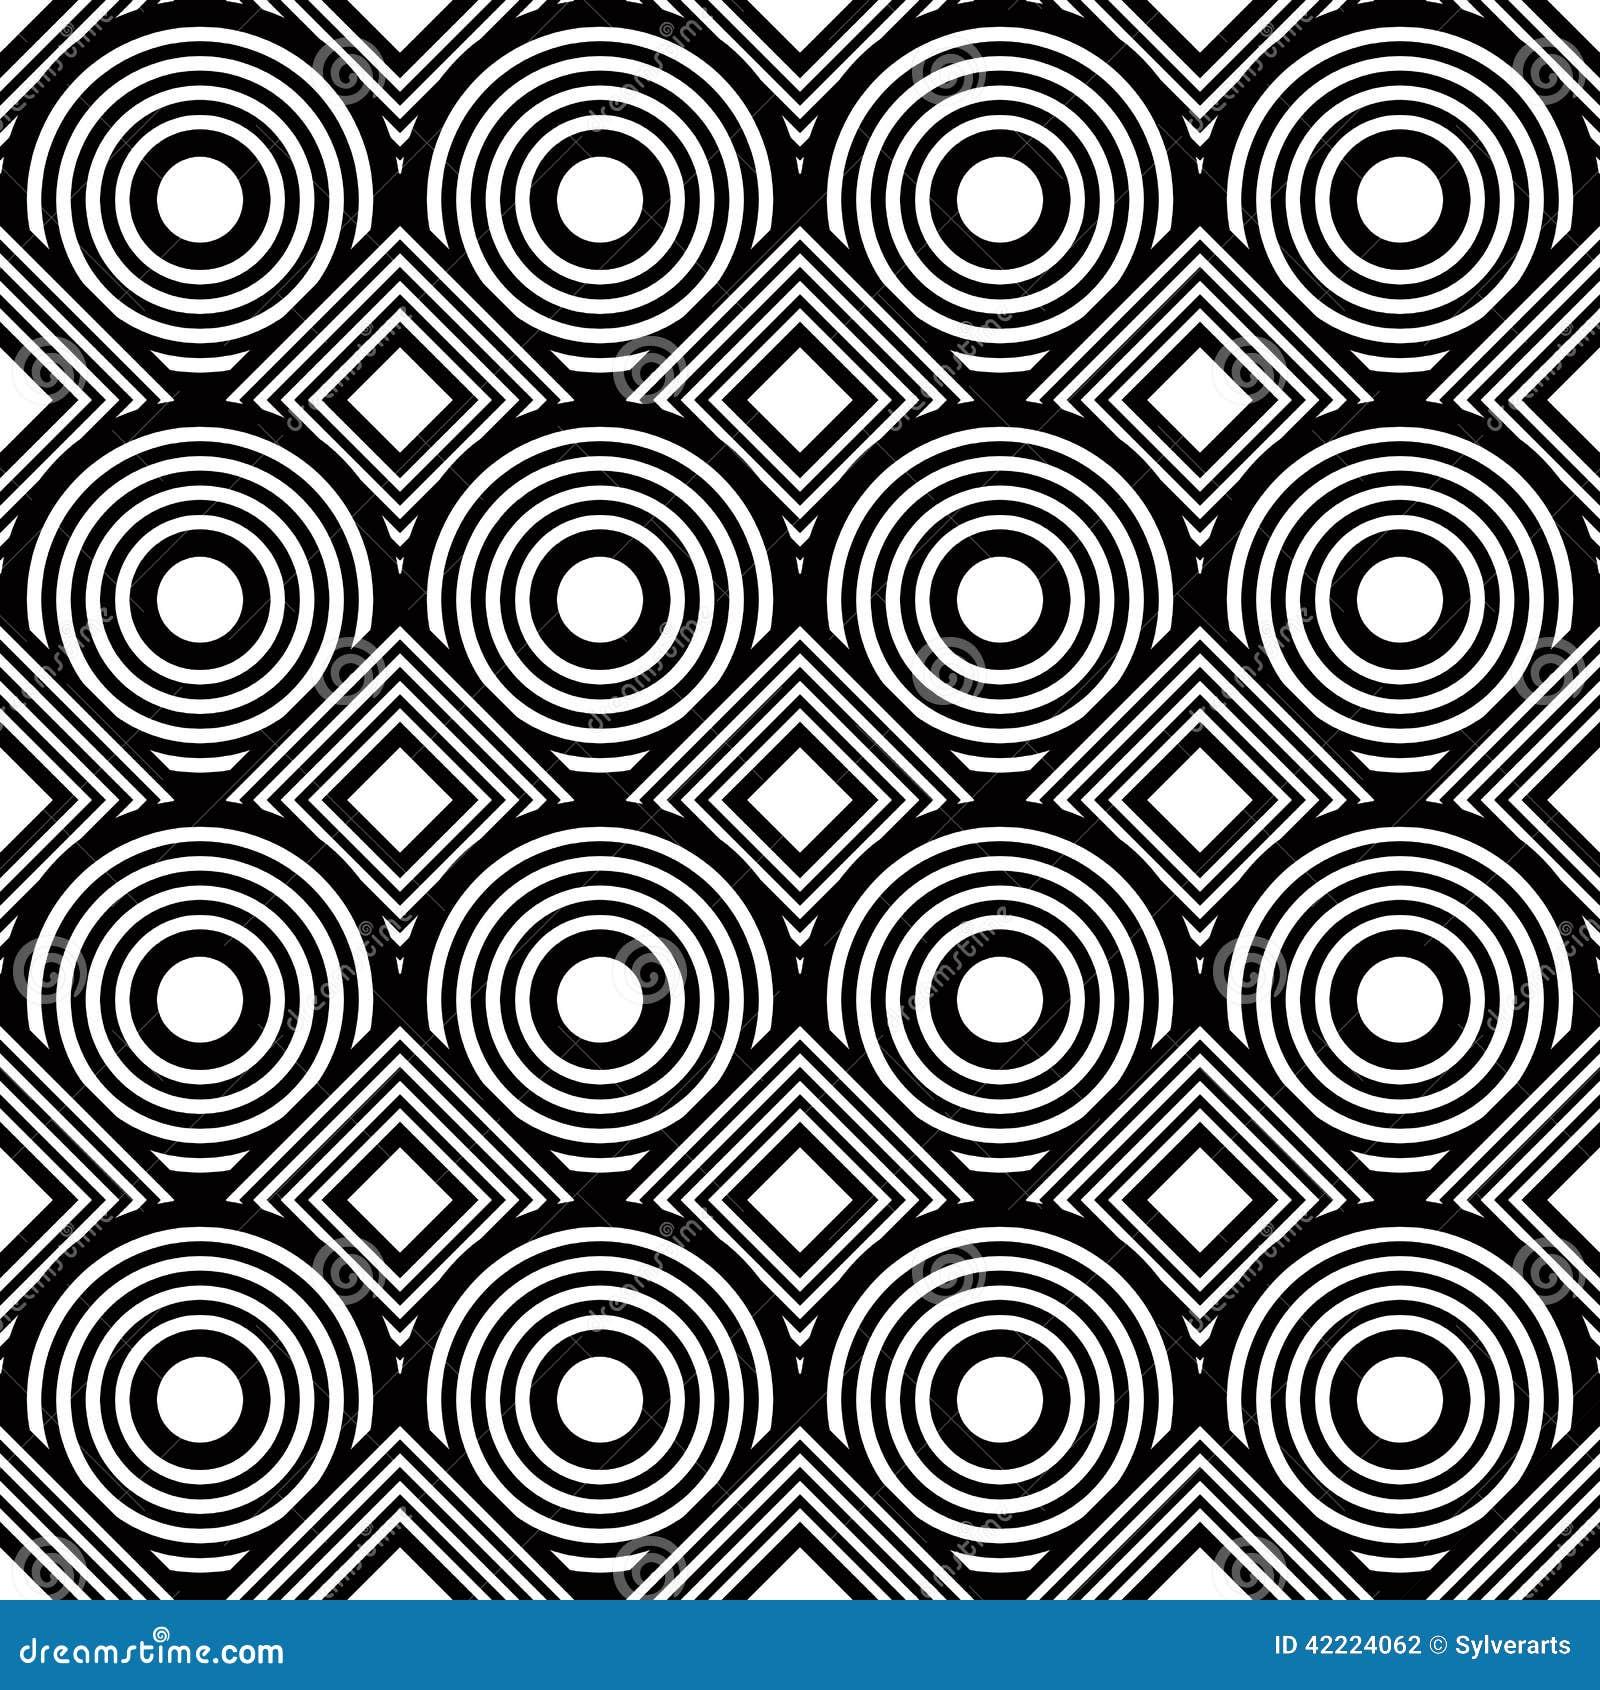 30 Easy amp Simple Mehndi Designs amp Henna Patterns 2012